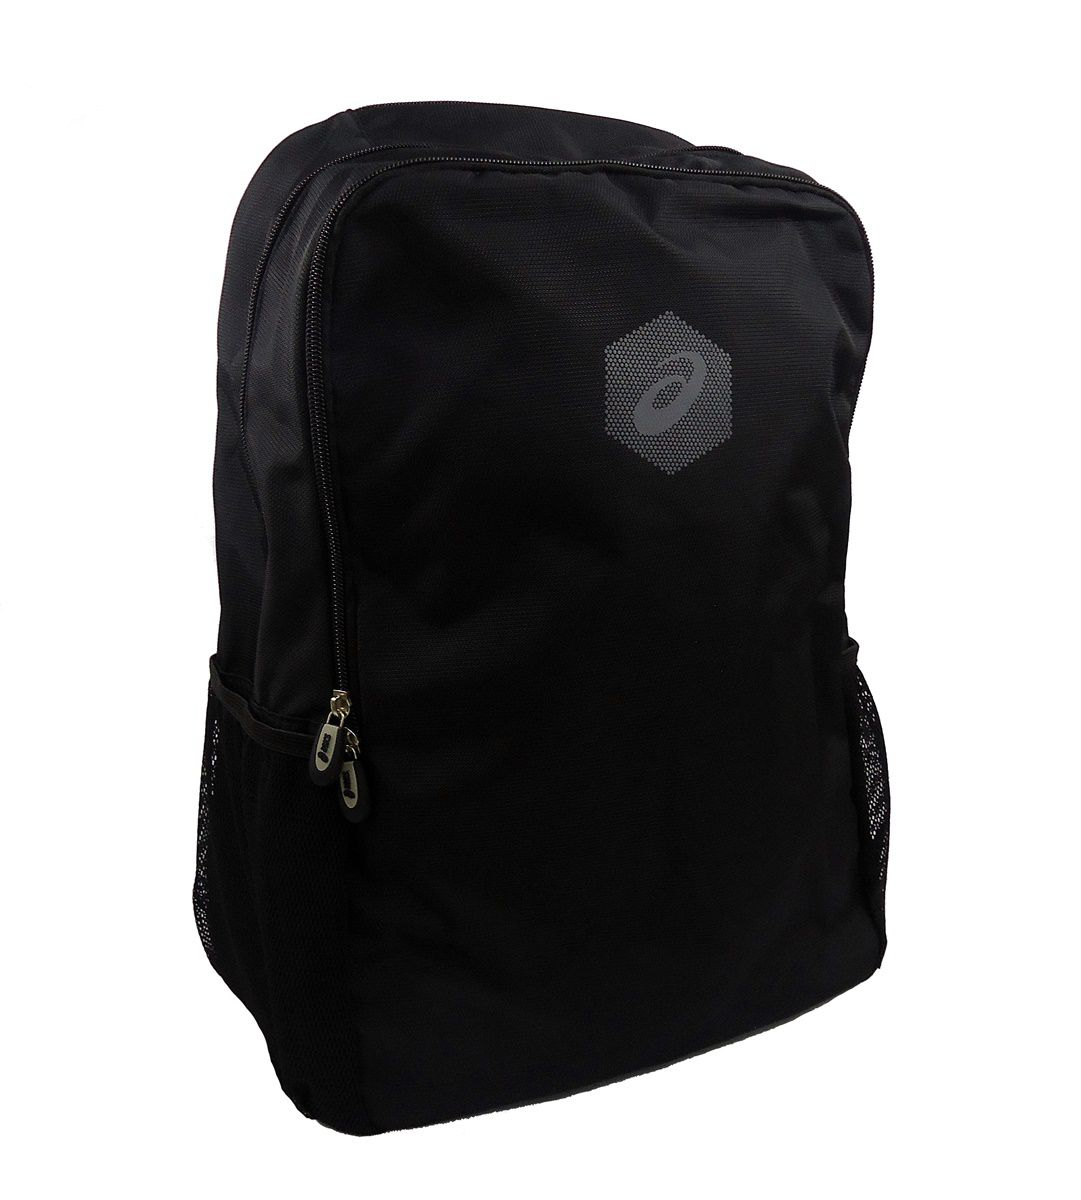 c9c8535fb Mochila Asics Backpack Com Porta Notebook - SPORT CENTER JARAGUÁ